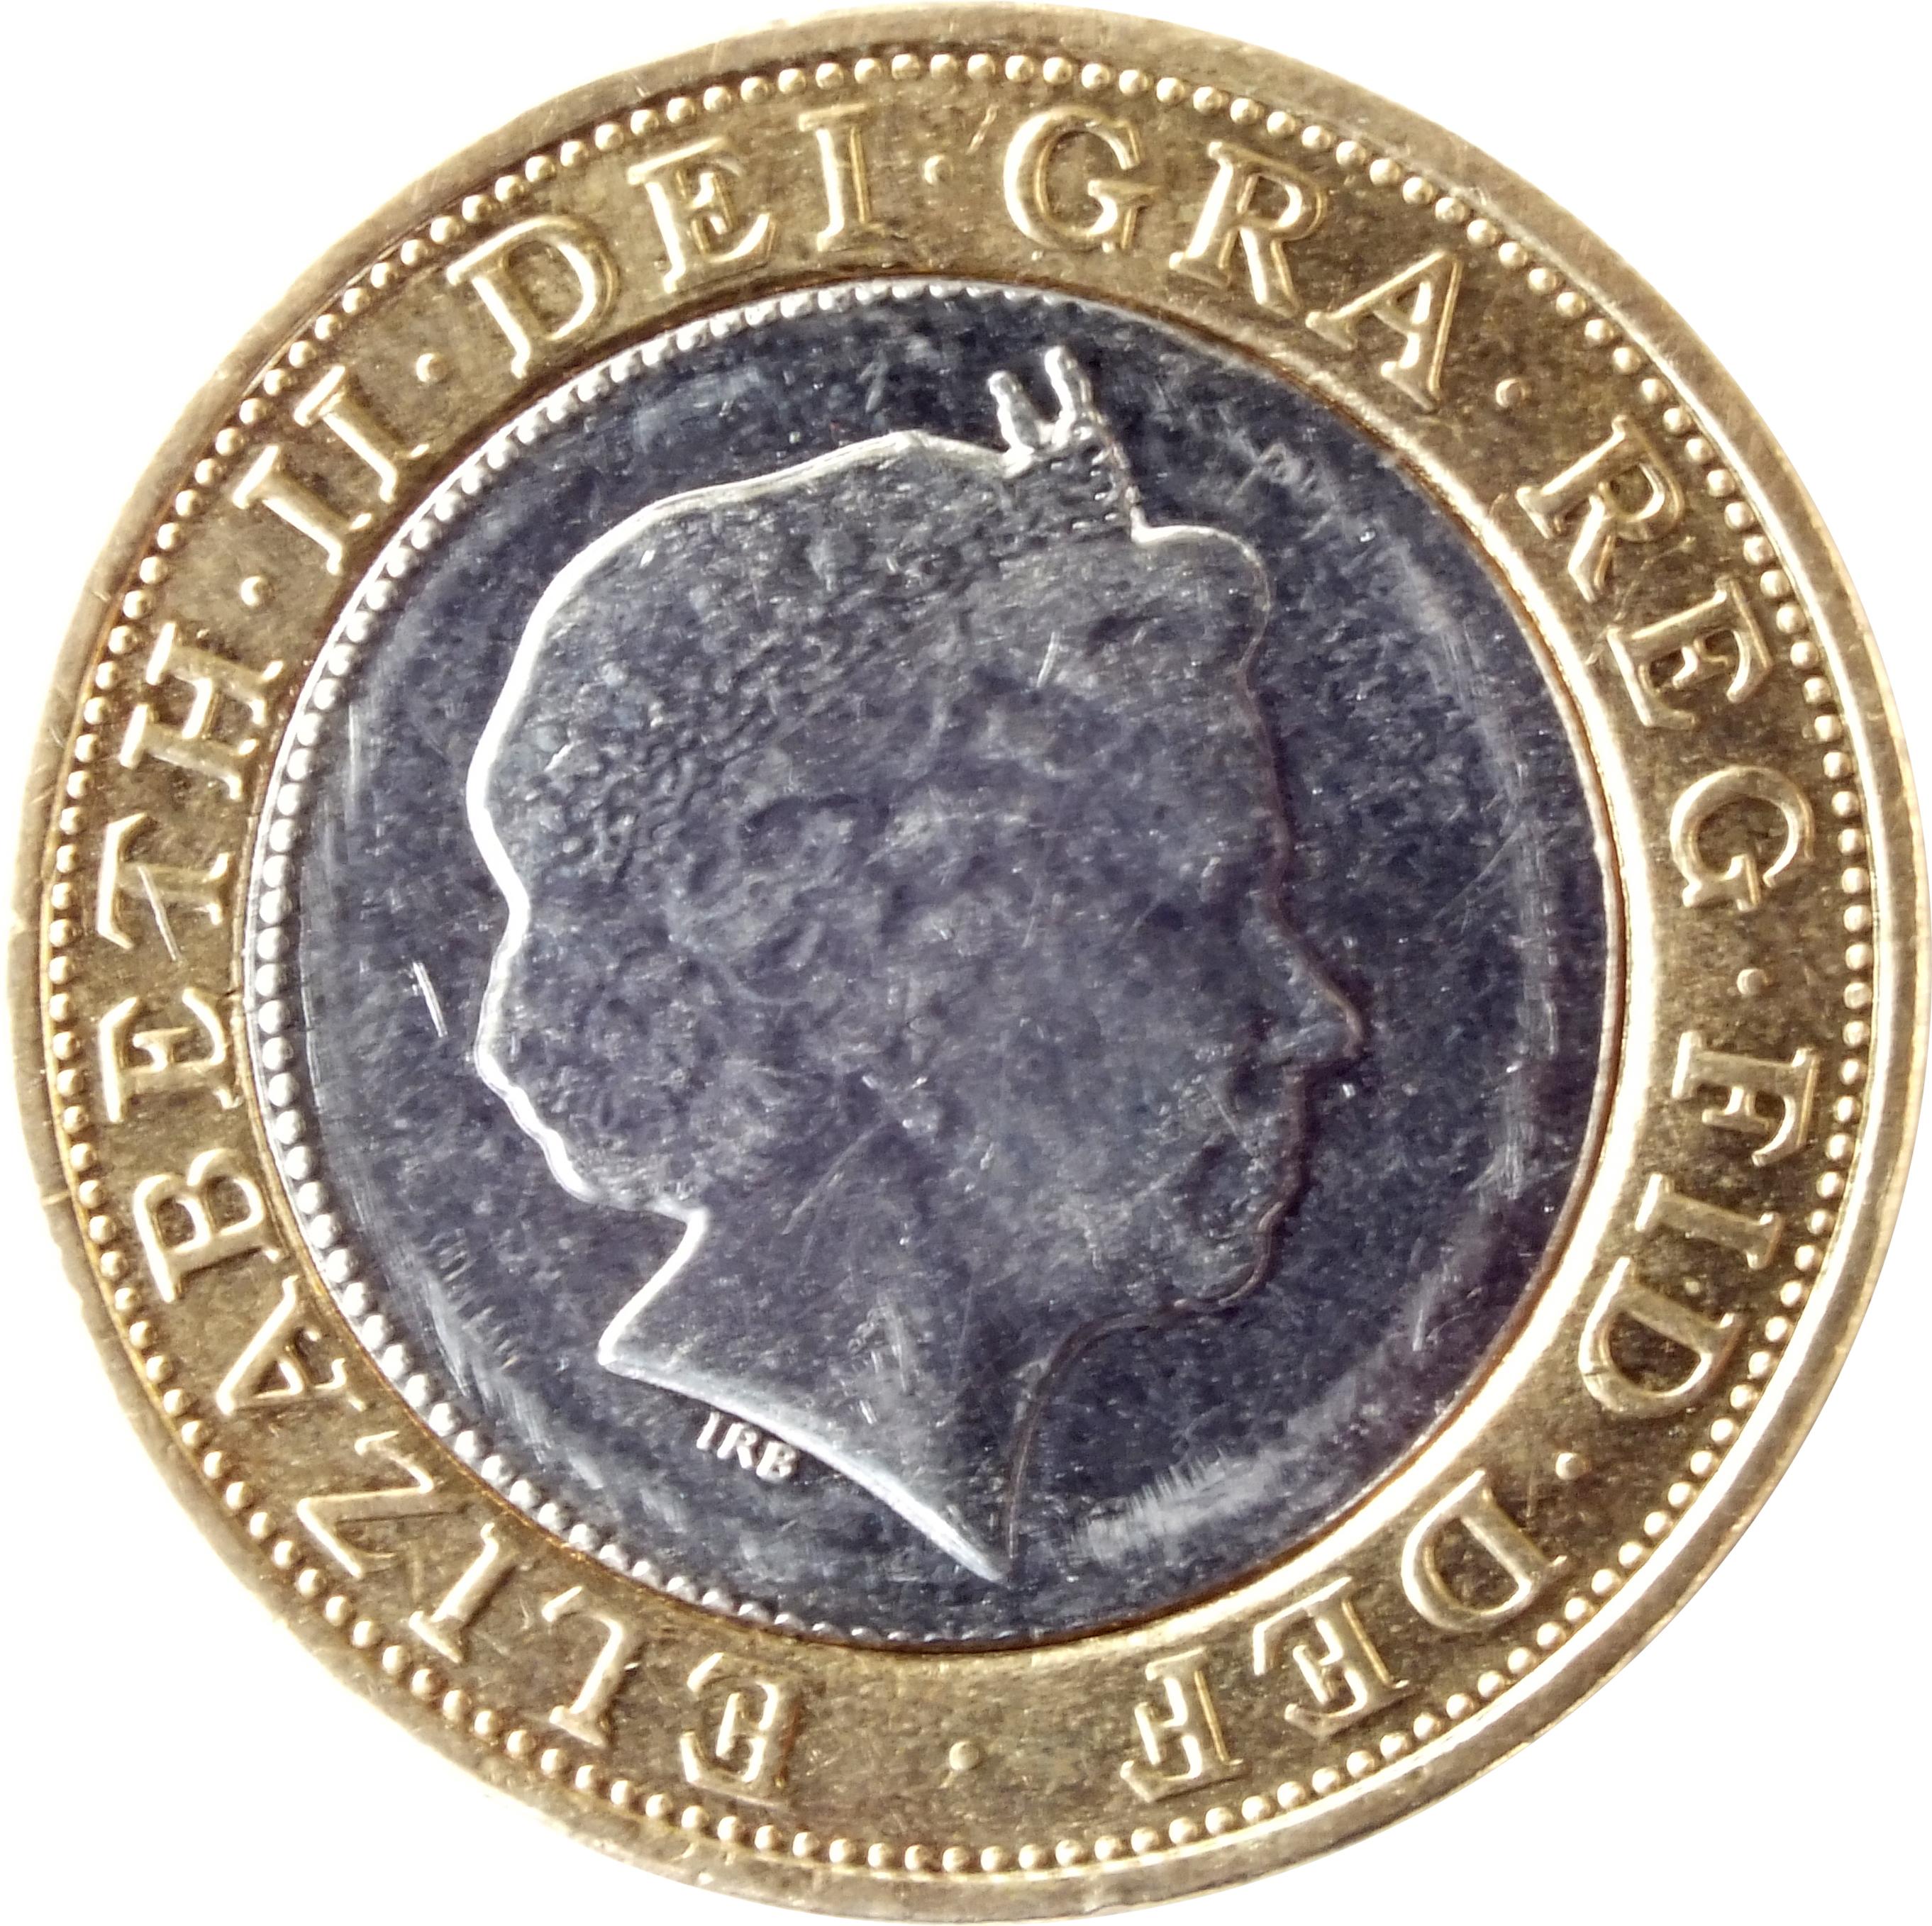 2 Pounds - Elizabeth II - 4'th Portrait (1998-2015) United Kingdom KM# 994 - CoinsBook